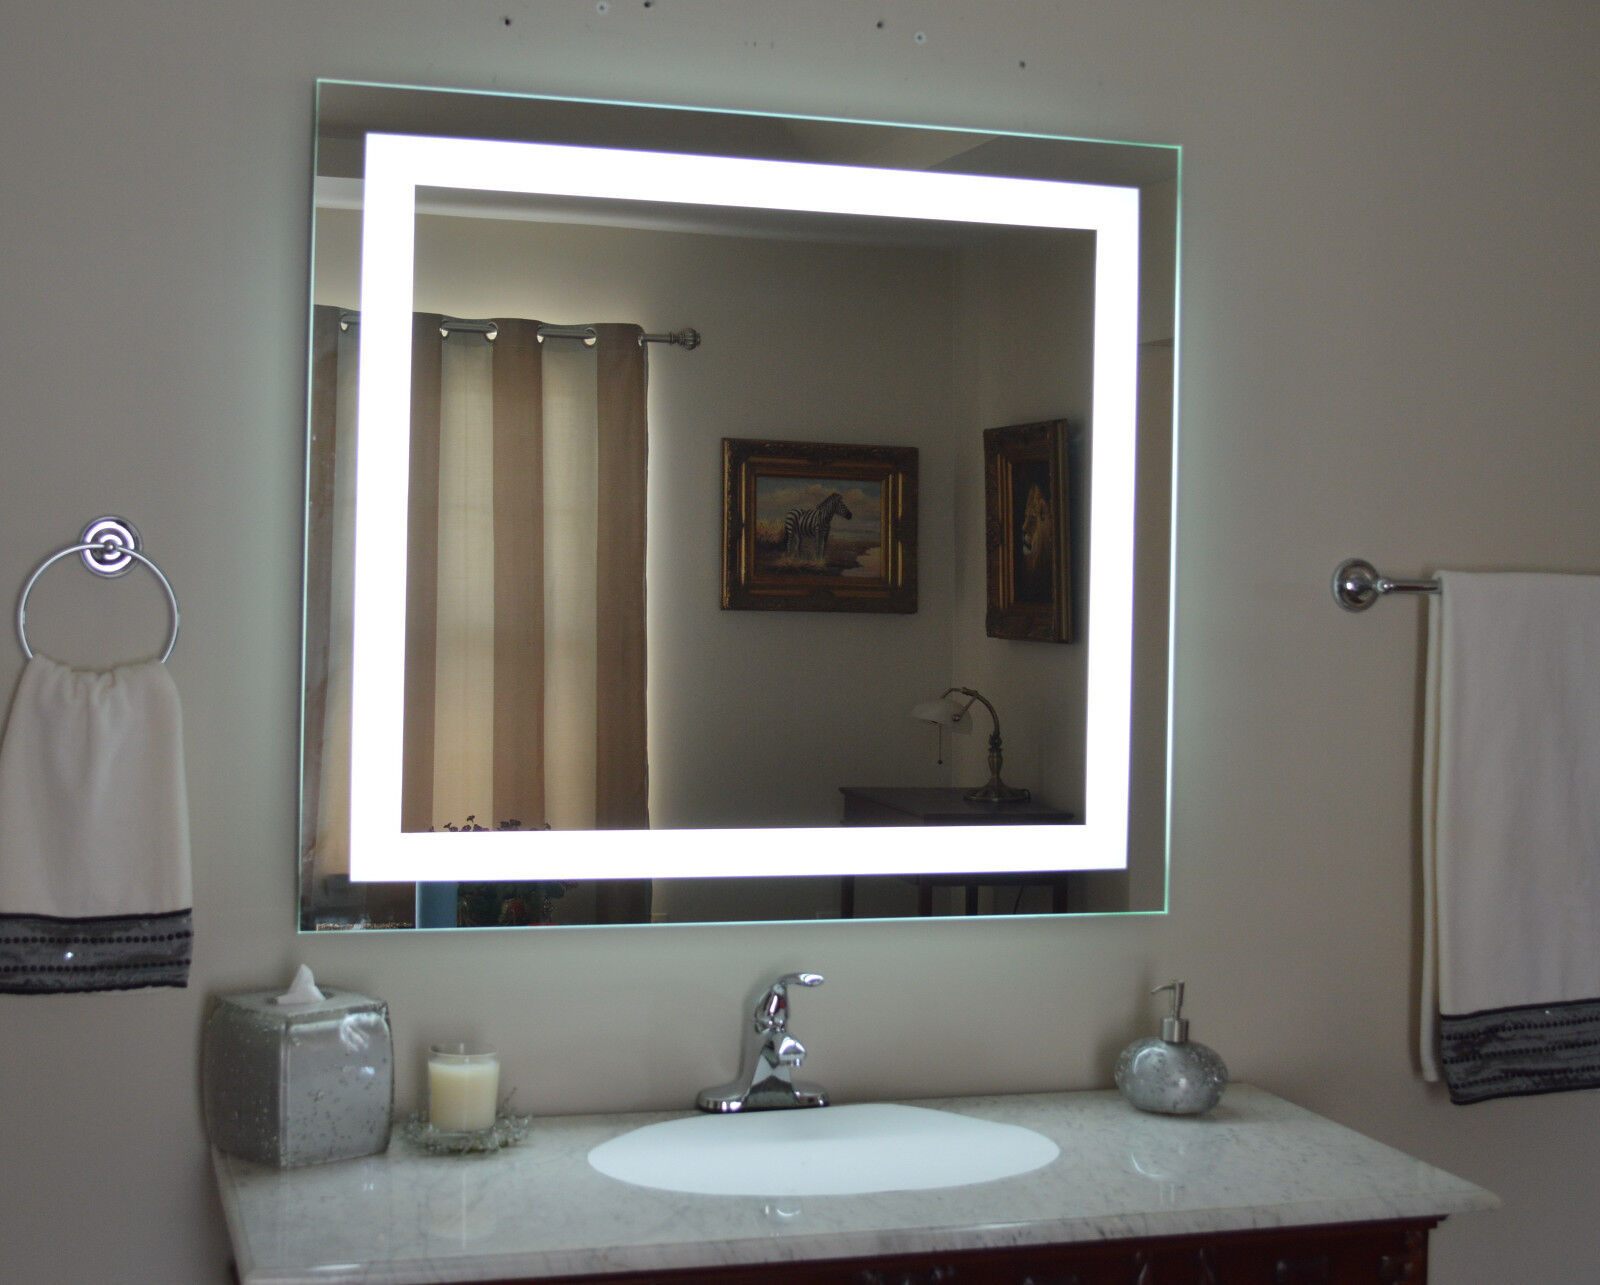 Lighted bathroom vanity mirror led  wall mounted 48 Wide x 36 Tall MAM84836  eBay